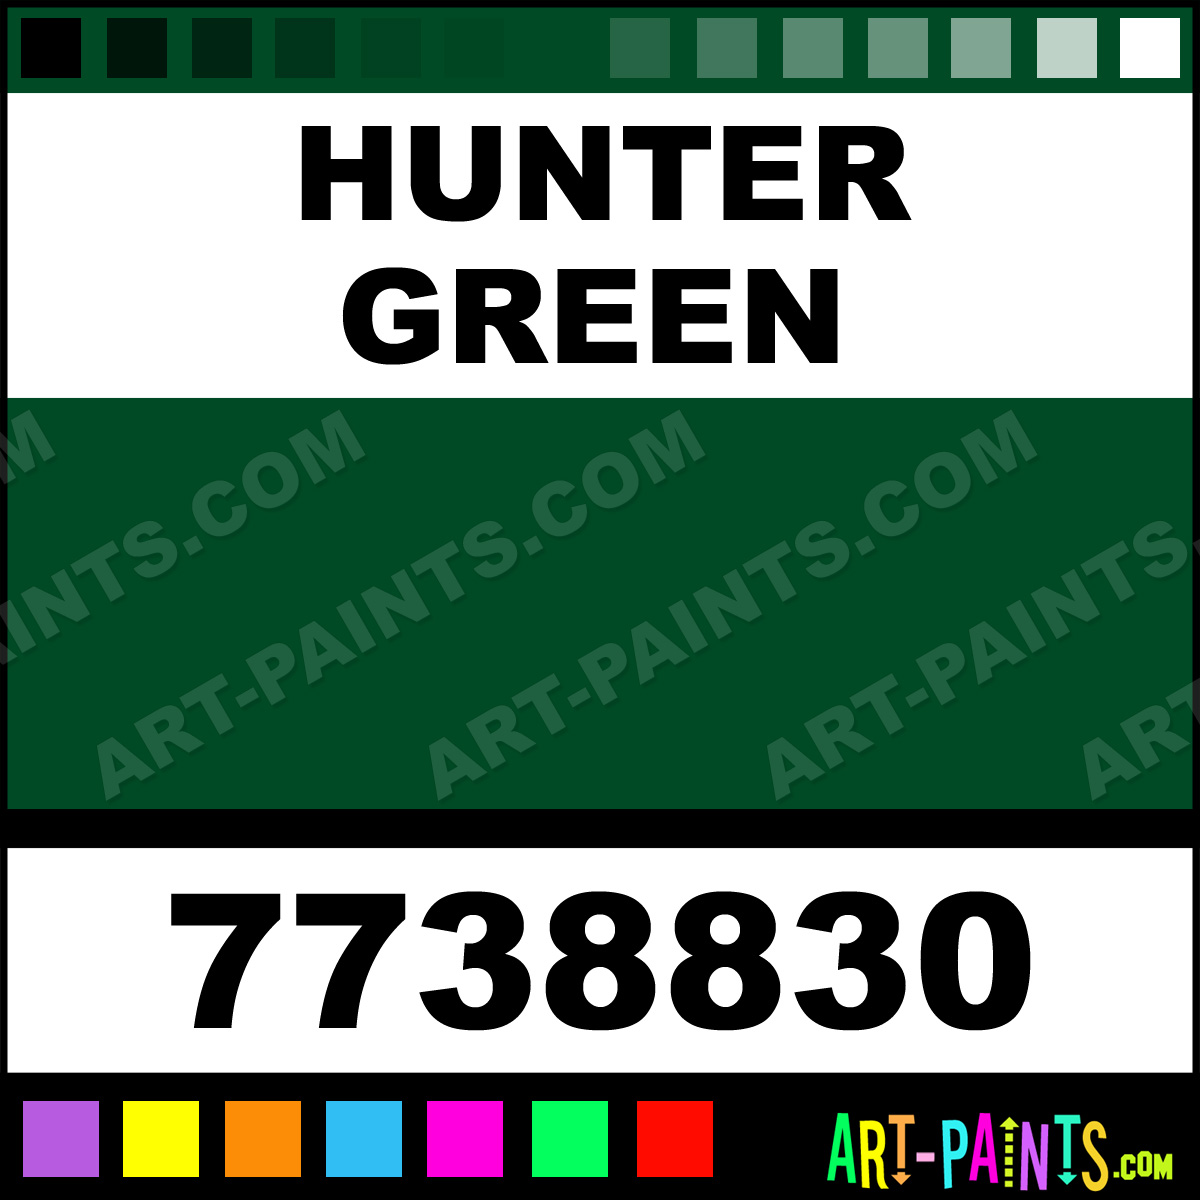 Hunter Green Gloss Protective Enamel Paints 7738830